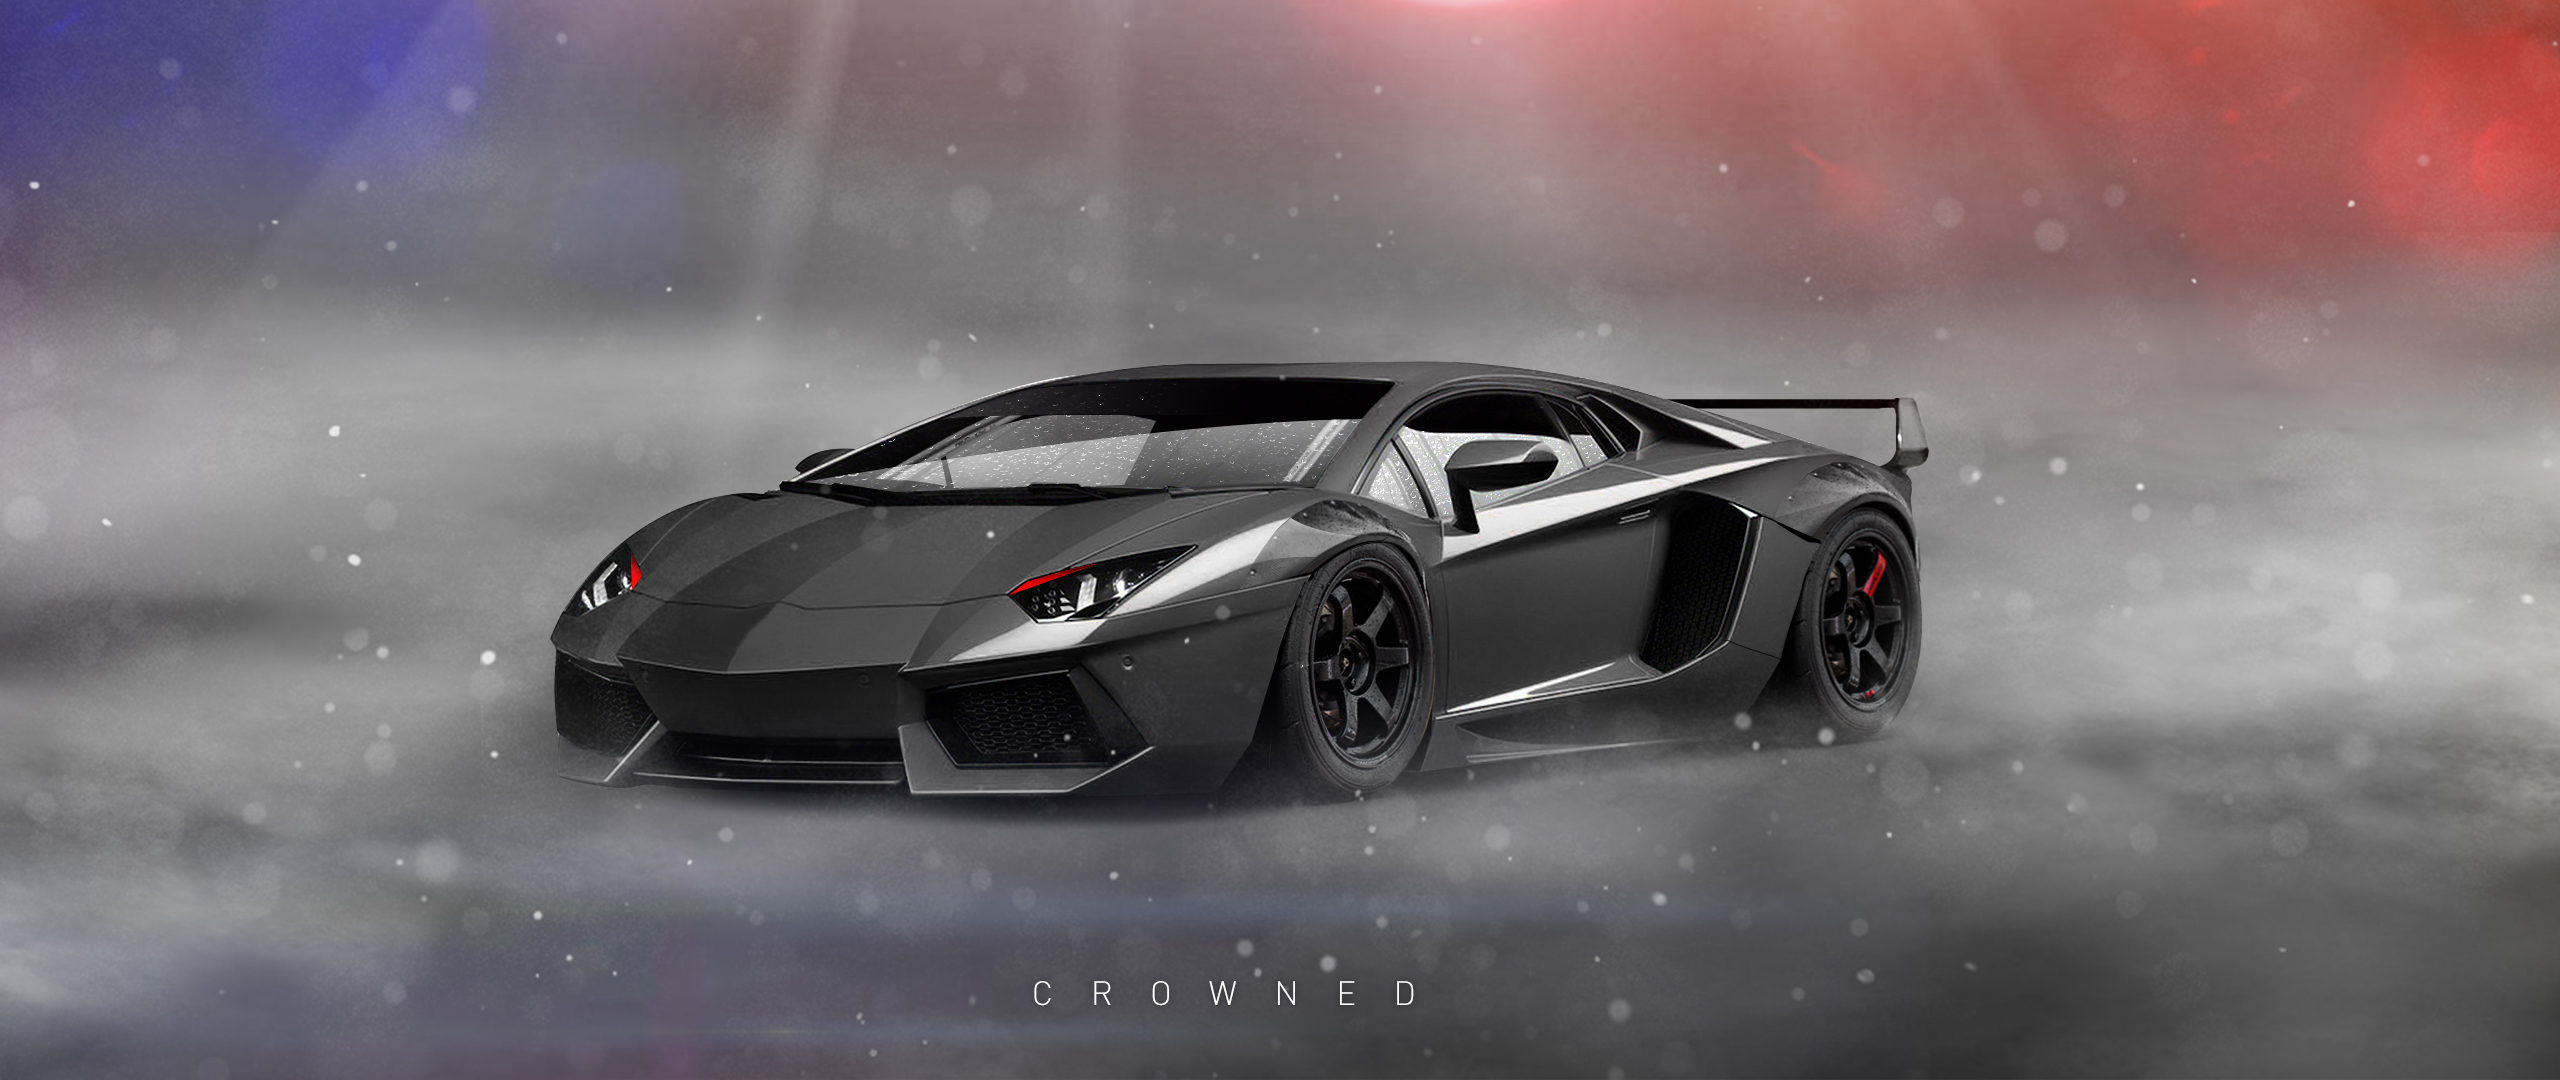 Lamborghini Aventador Photoshop Time Lapse